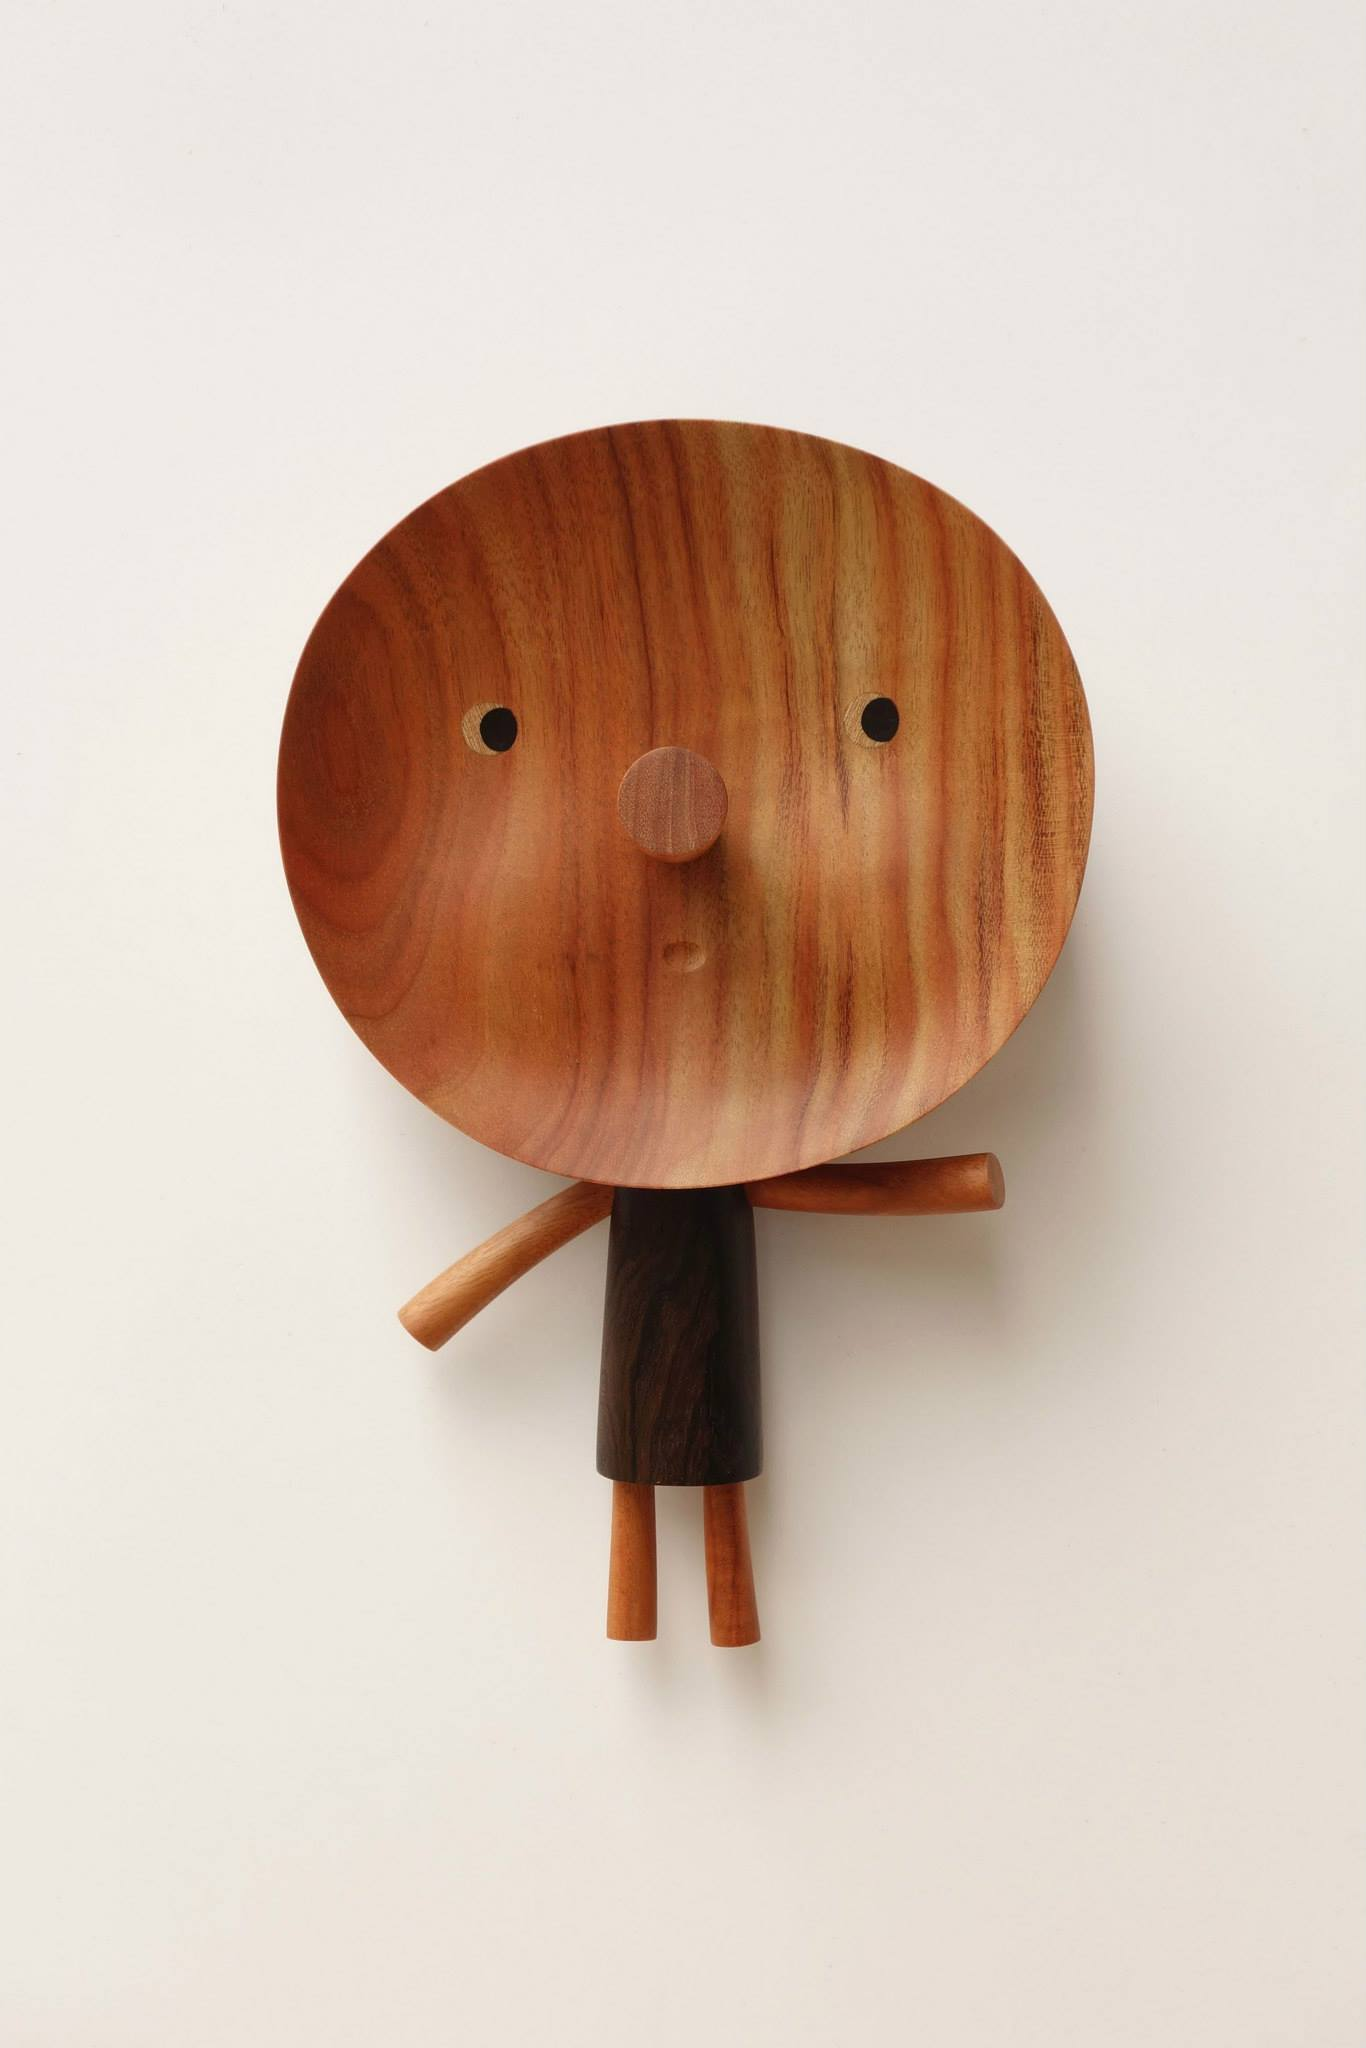 yen jui-lin madera mis gafas de pasta14